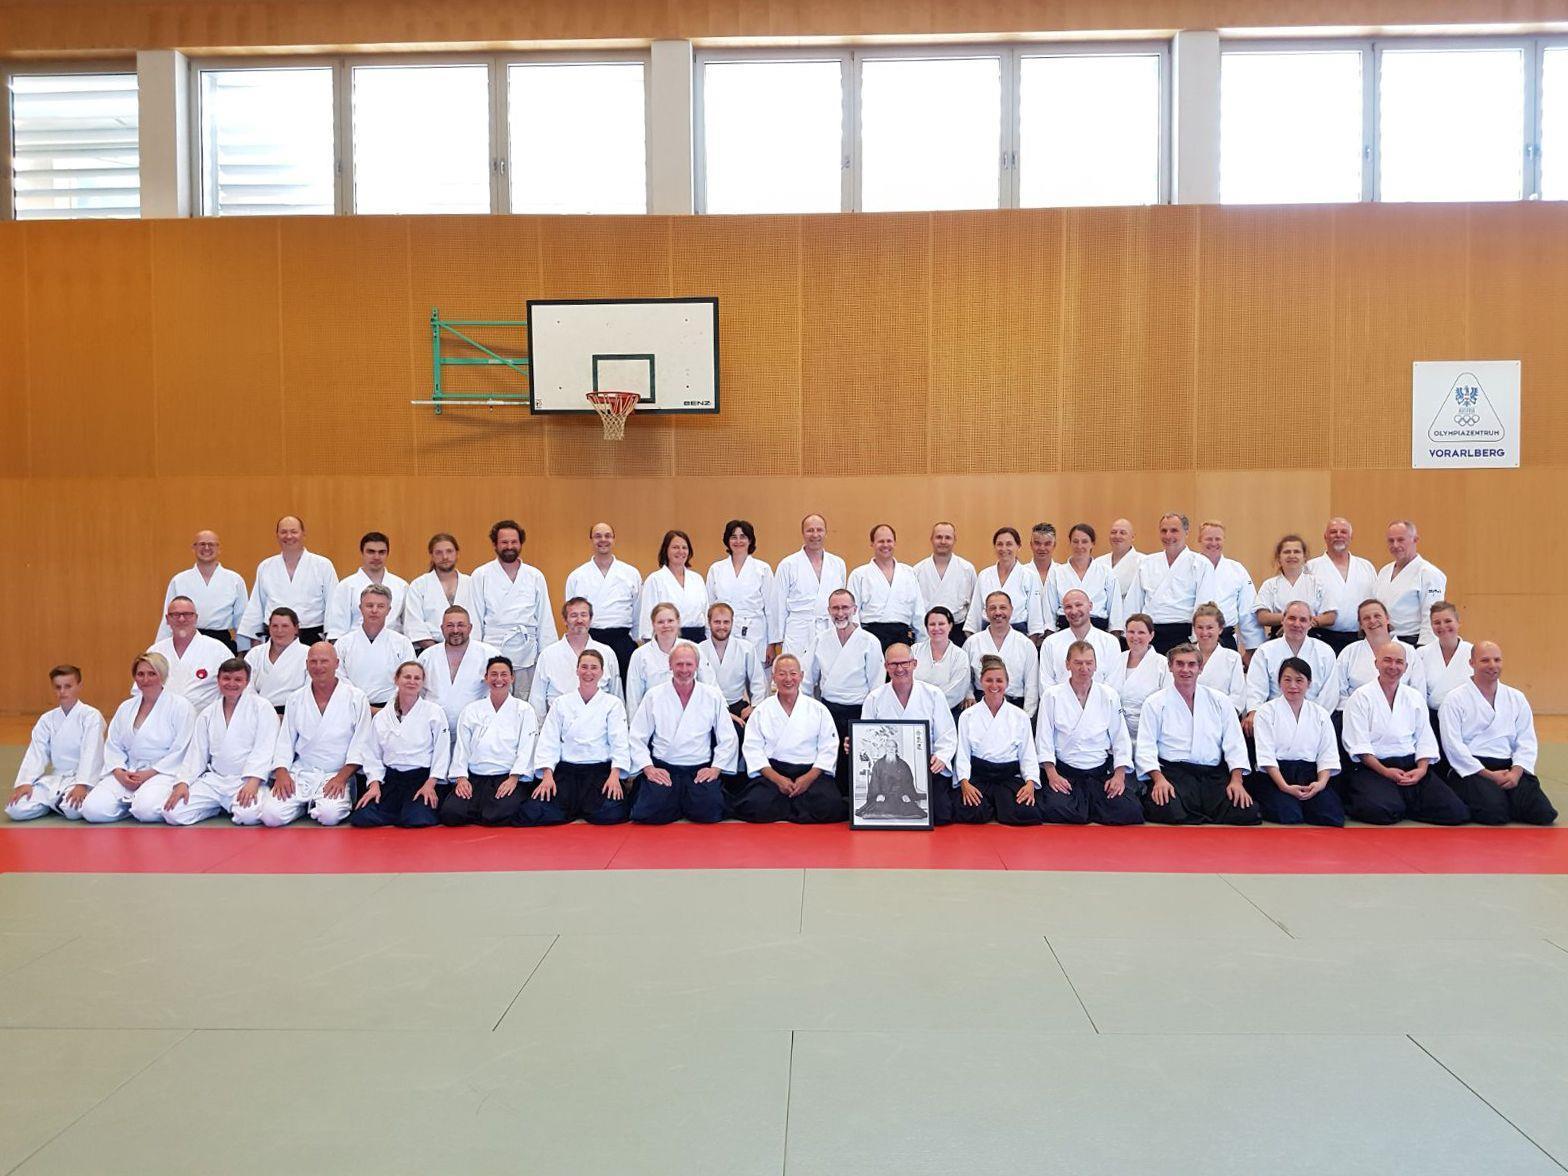 Gruppenbild mit den Teilnehmern des 24. International Aikido-Seminar mit Endo Seishiro Shihan, 8. Dan